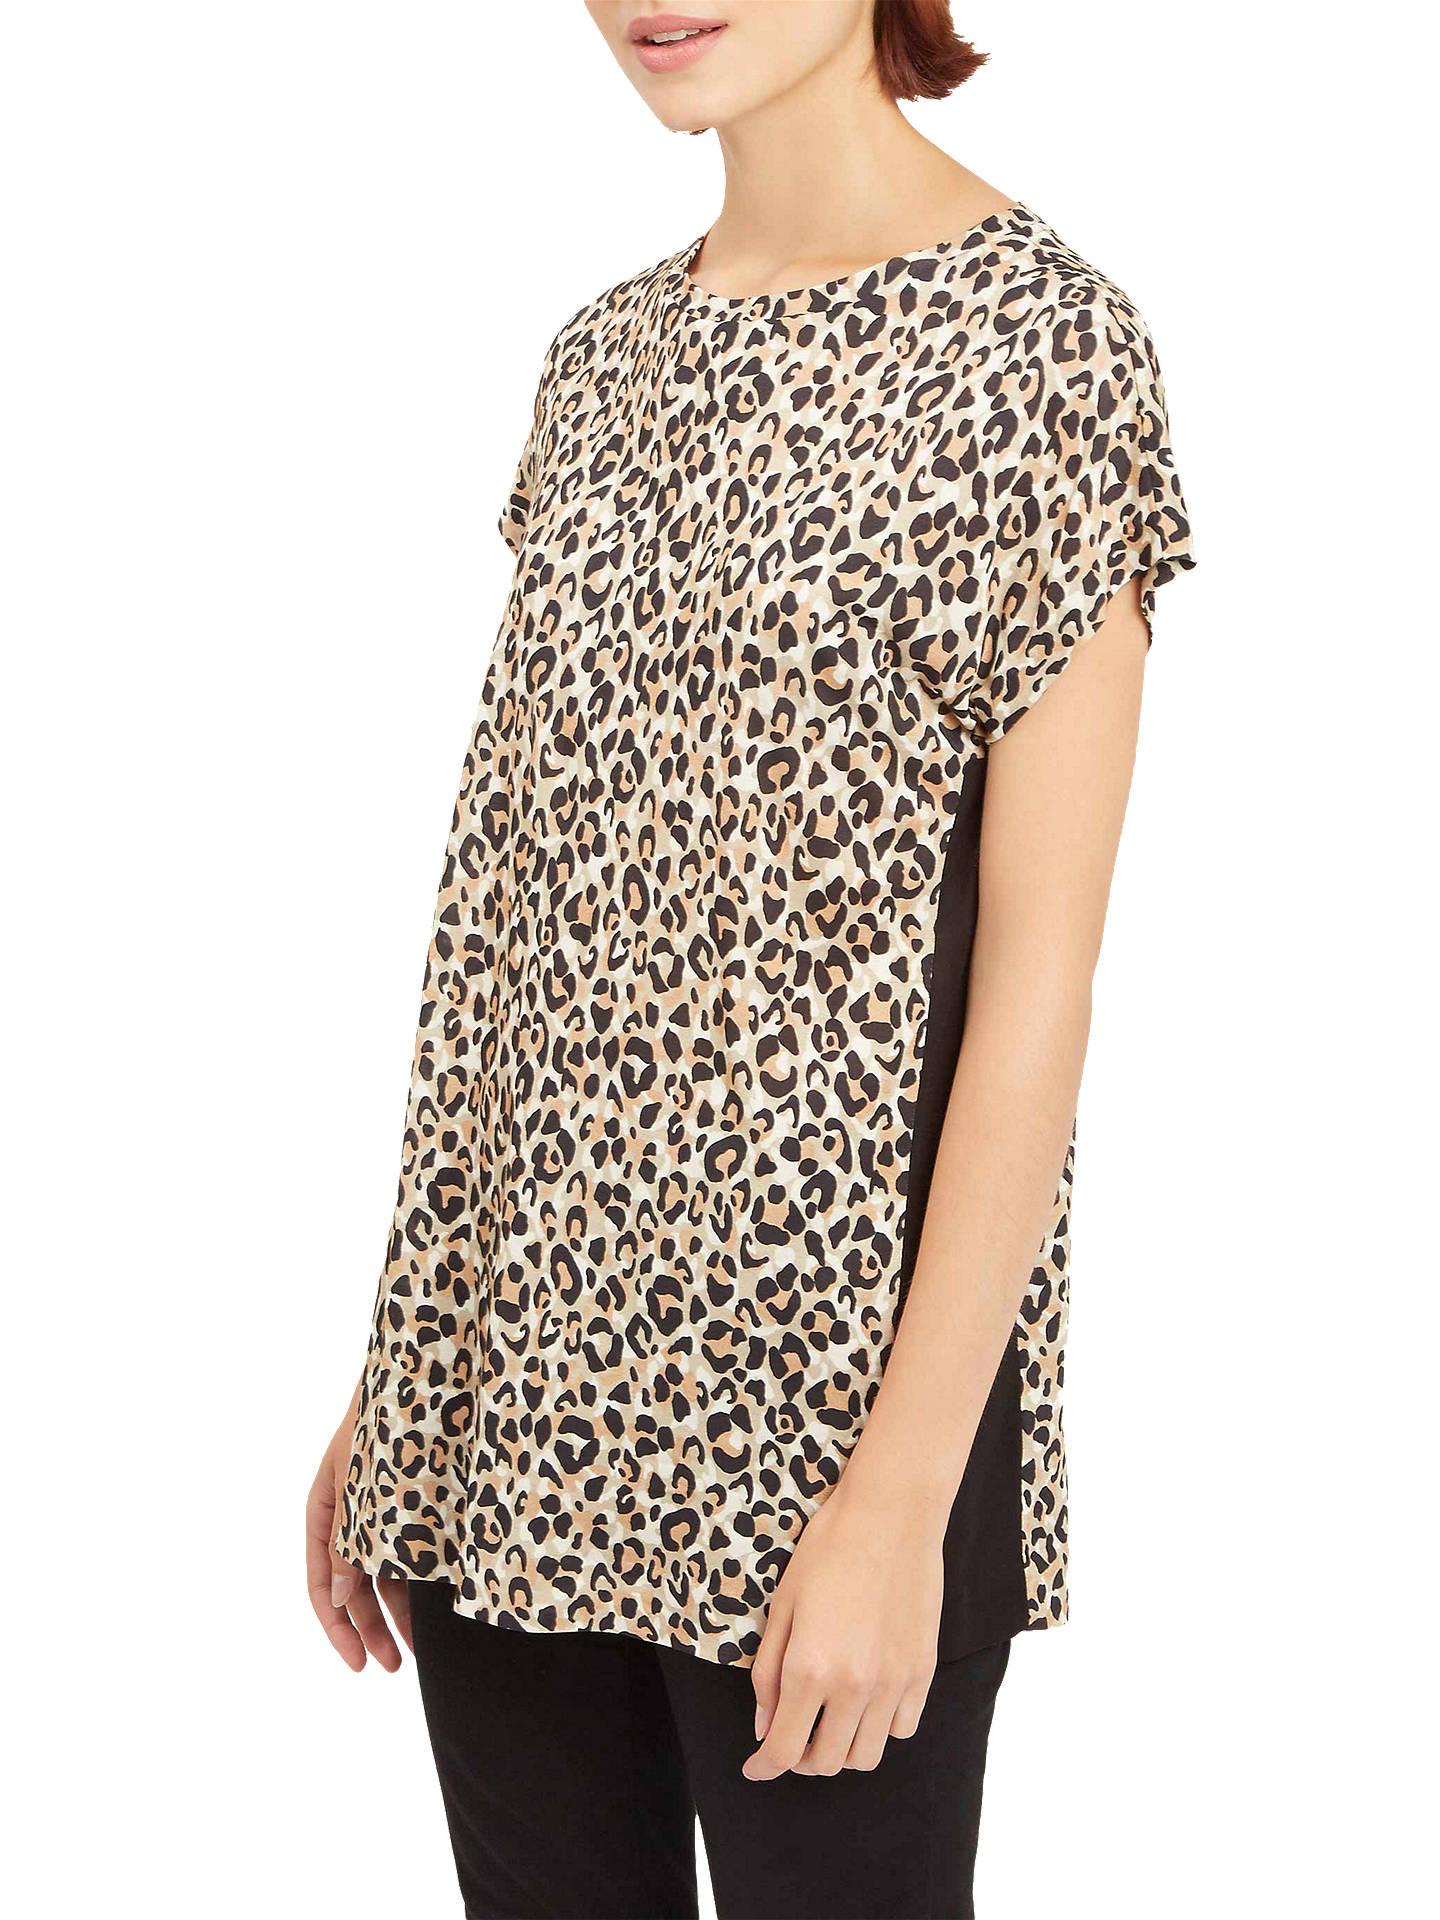 cfa1467bb741 Buy Jaeger Jersey Leopard Print Top, Black/Green, XS Online at johnlewis.